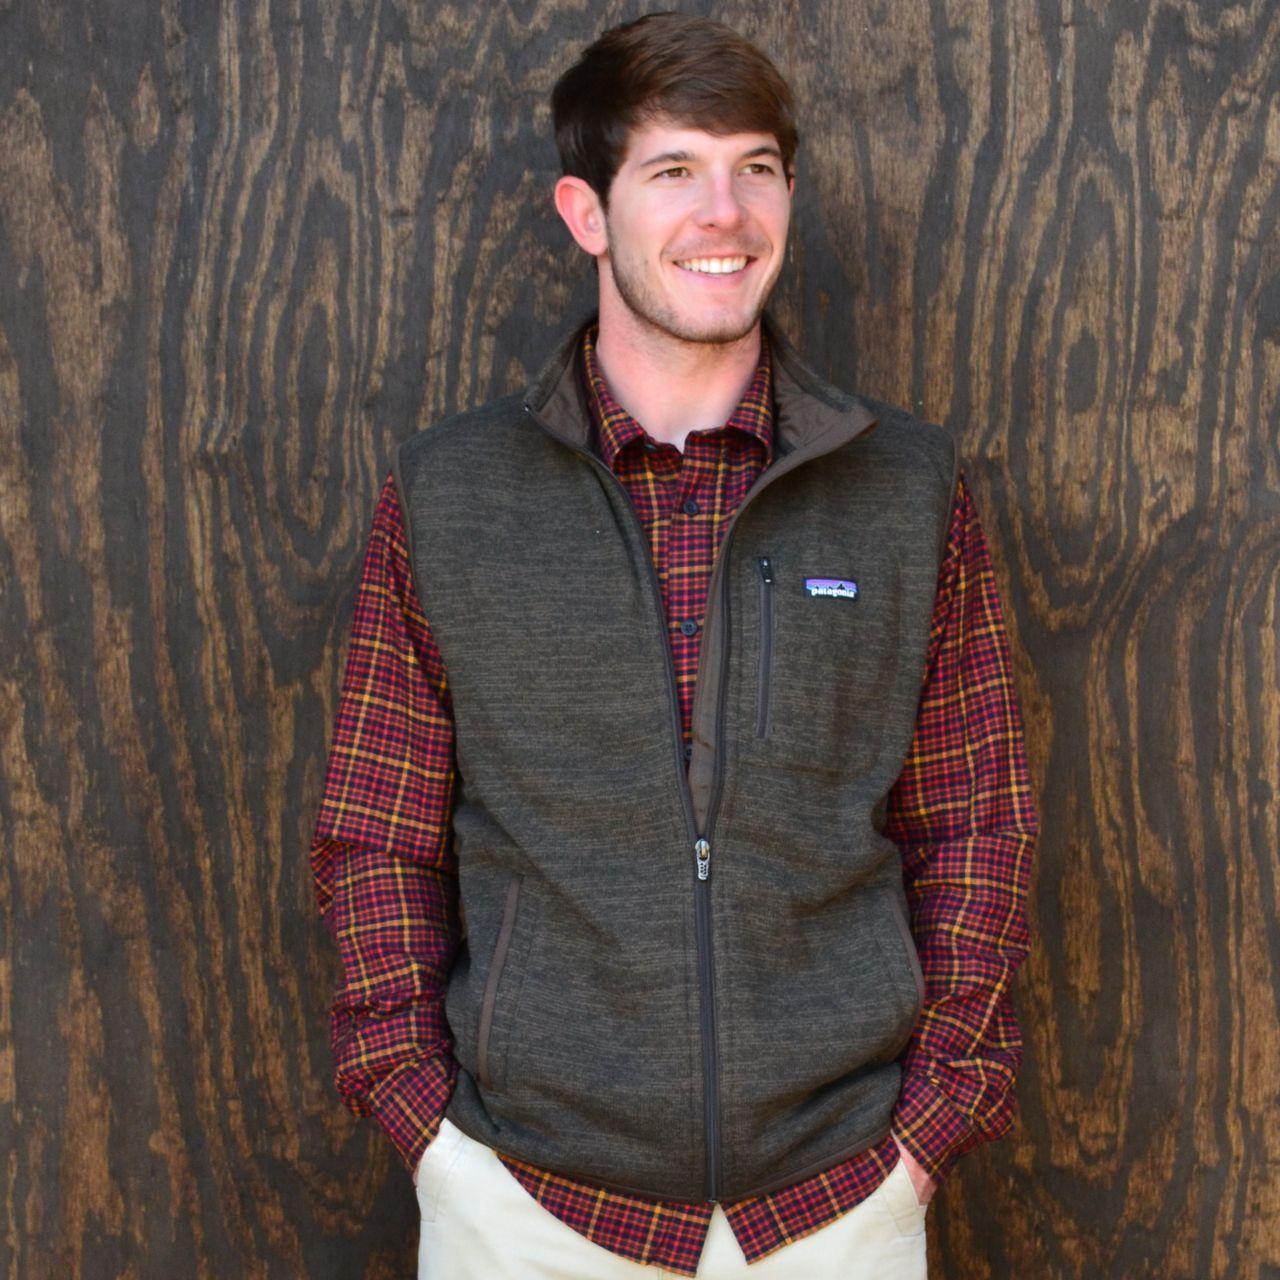 7a5aae8222 Patagonia Men s Better Sweater Fleece Vest in Dark Walnut — The Squire Shop